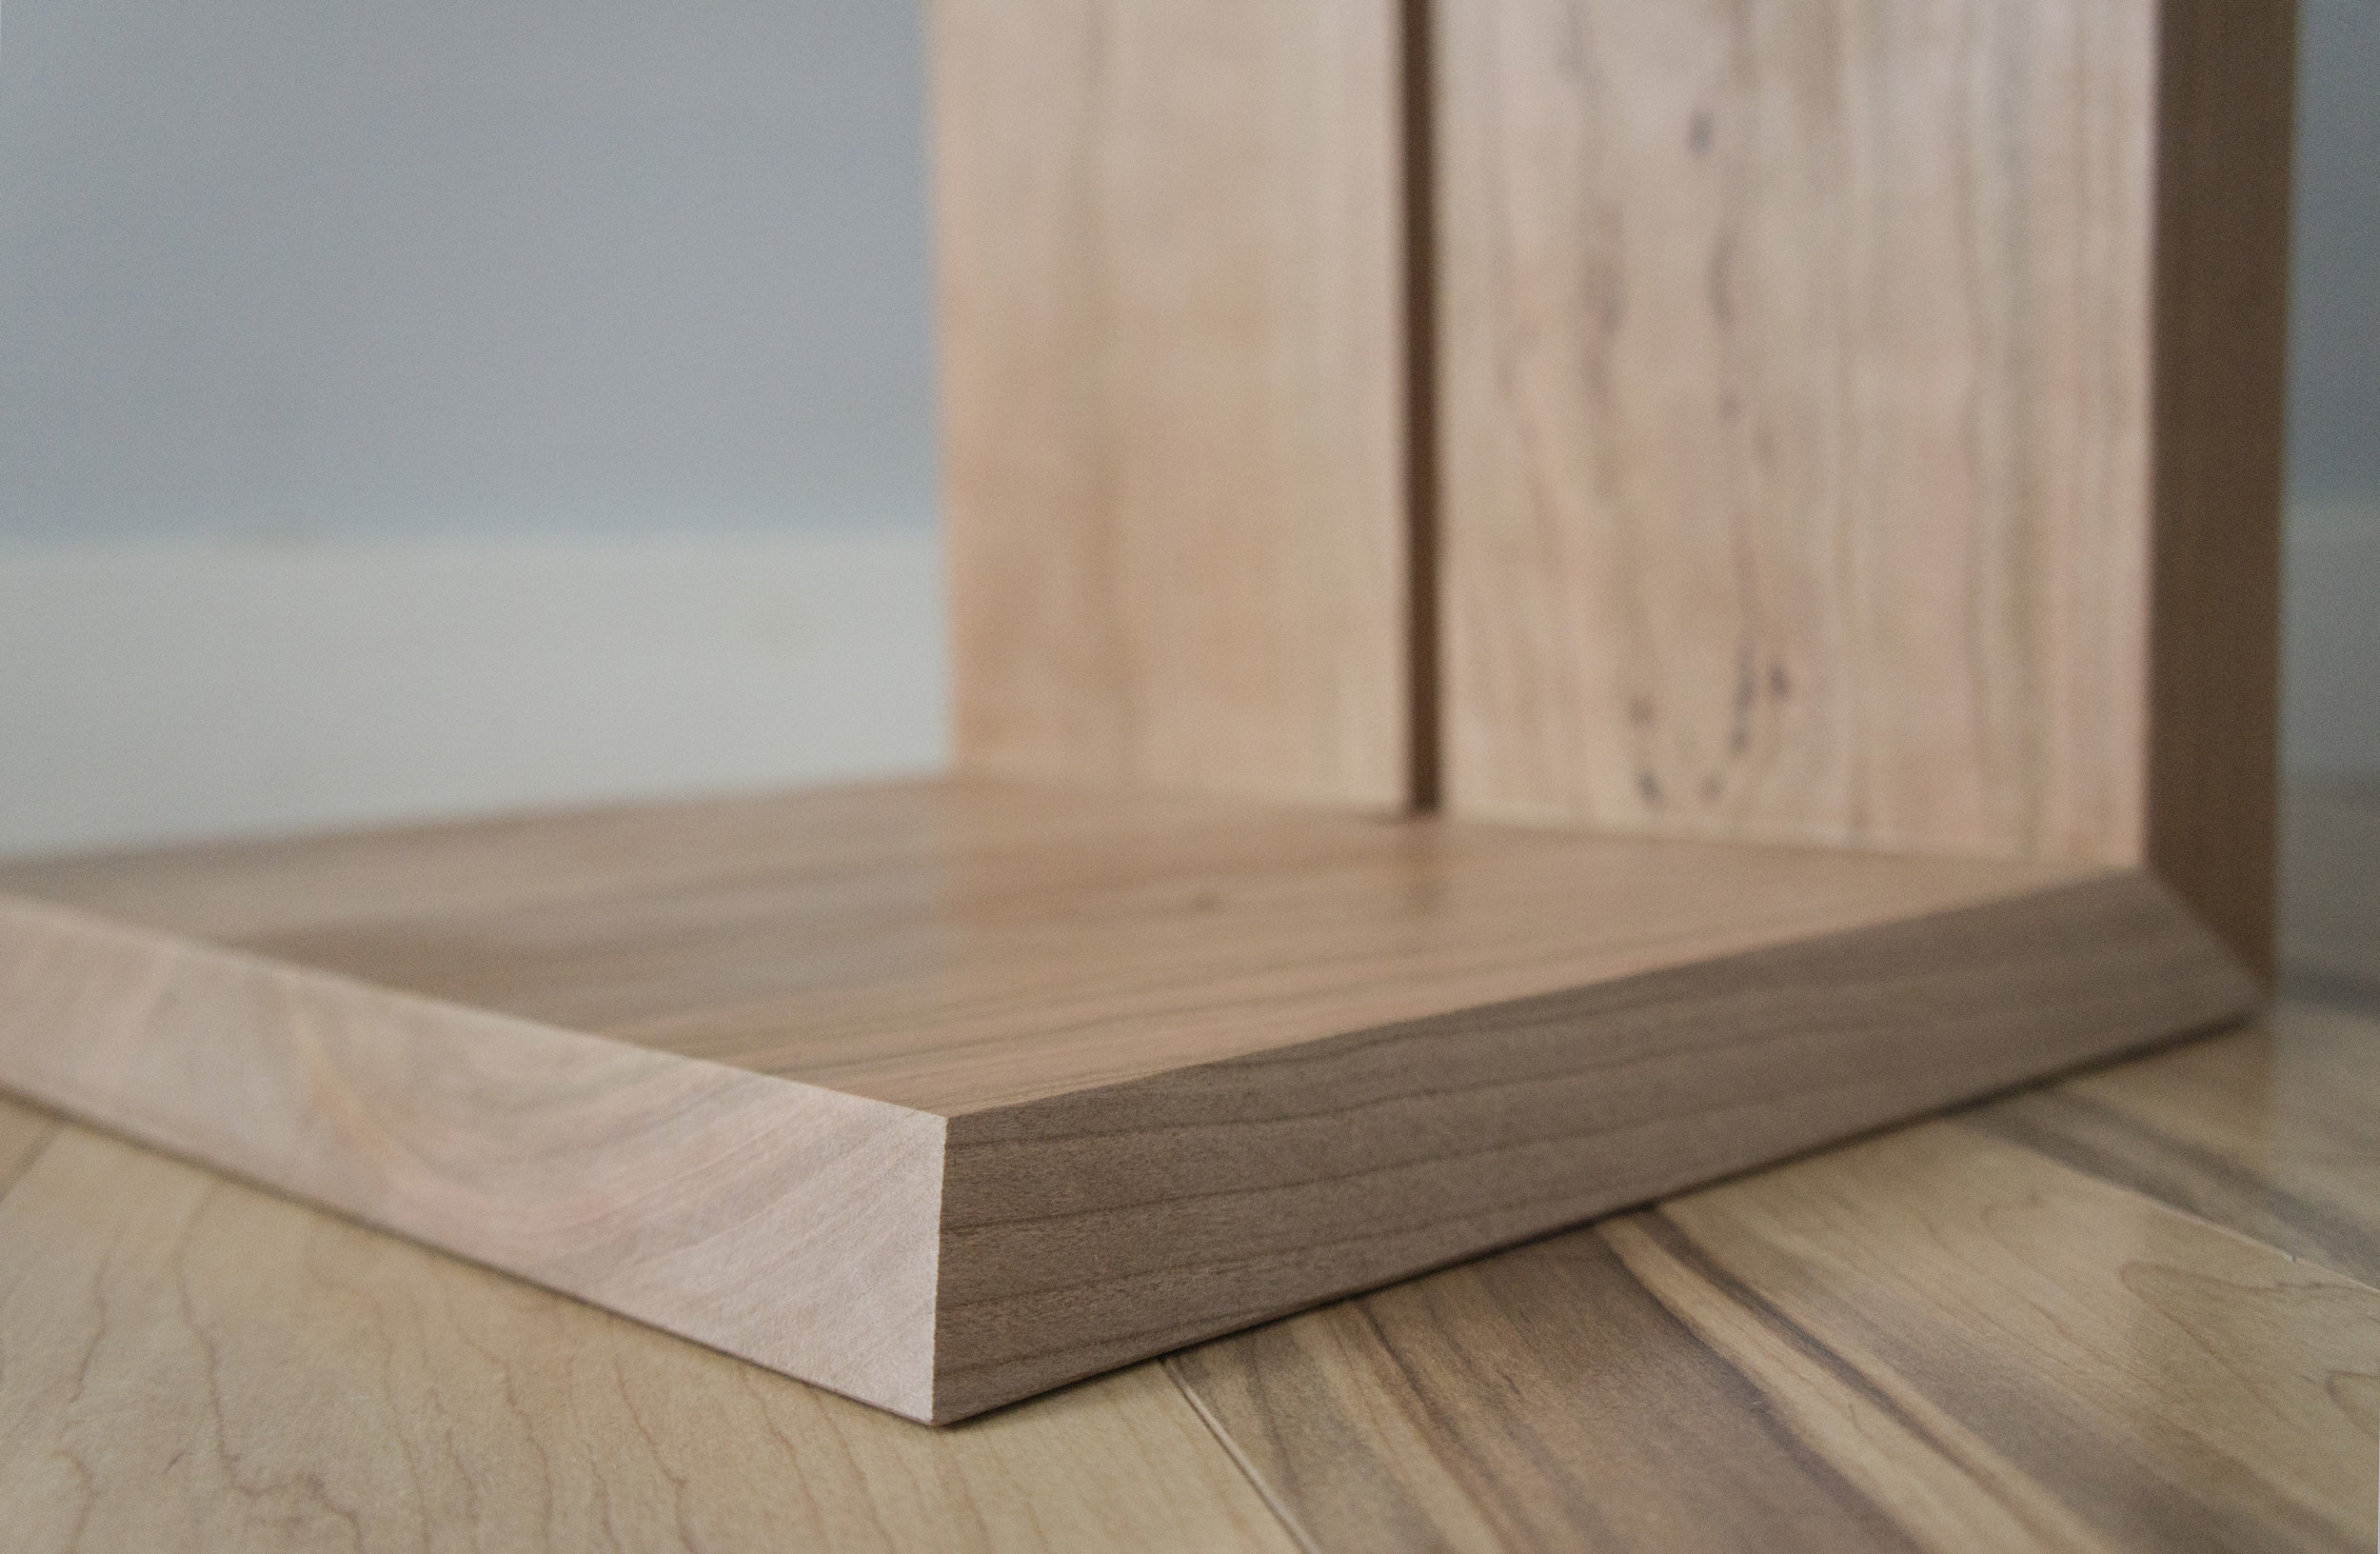 Euclid table_SONY NEX_close up bottom corner.jpg